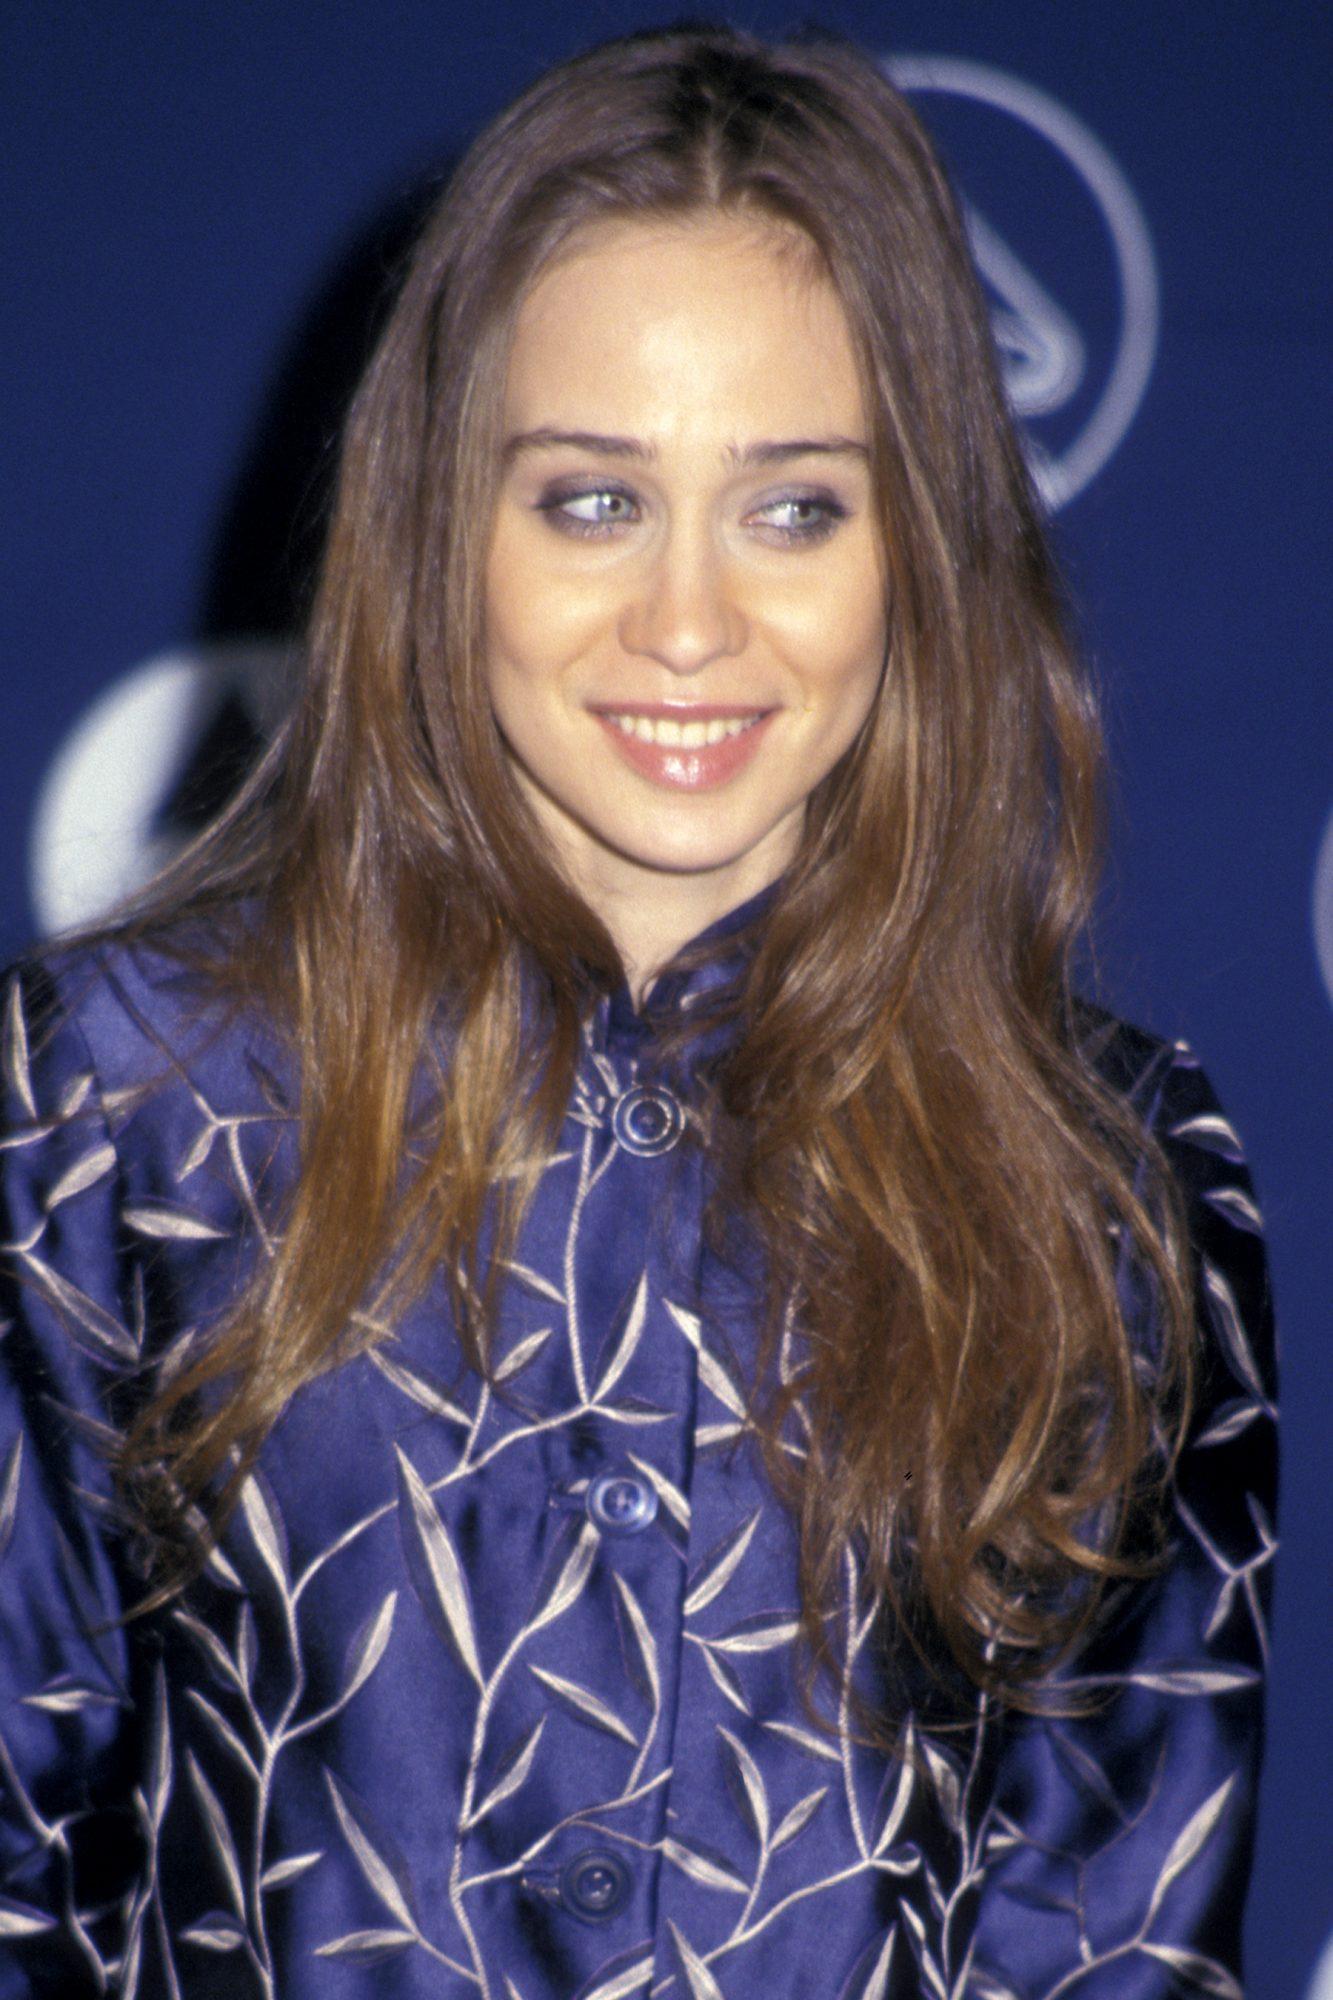 39th Annual Grammy Awards